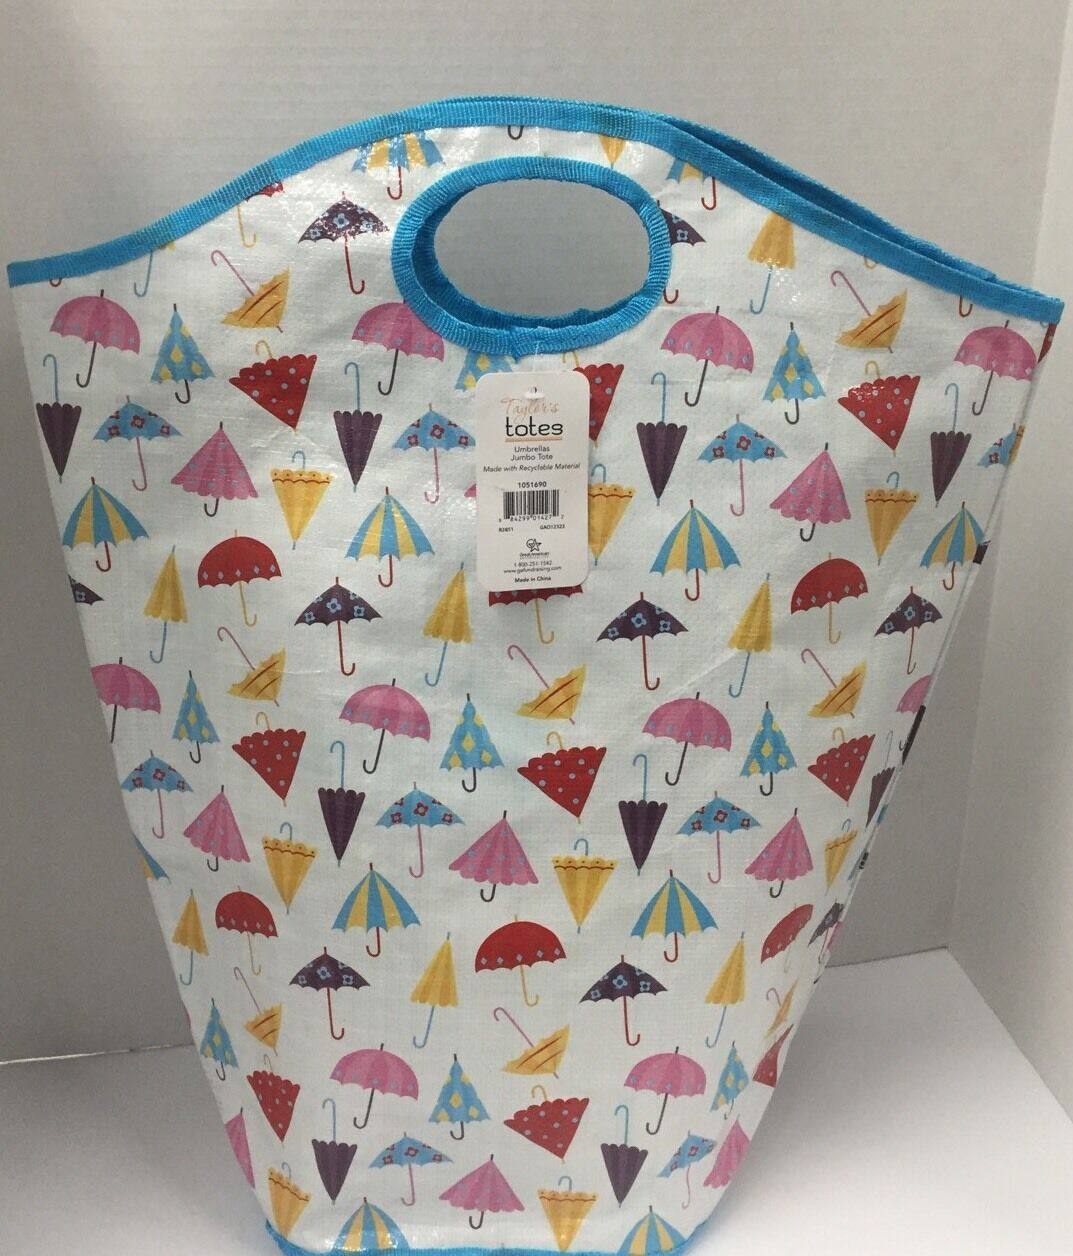 Taylor's Totes Jumbo Tote Bag Umbrellas Lot of 2 Reusable Bags (NEW)